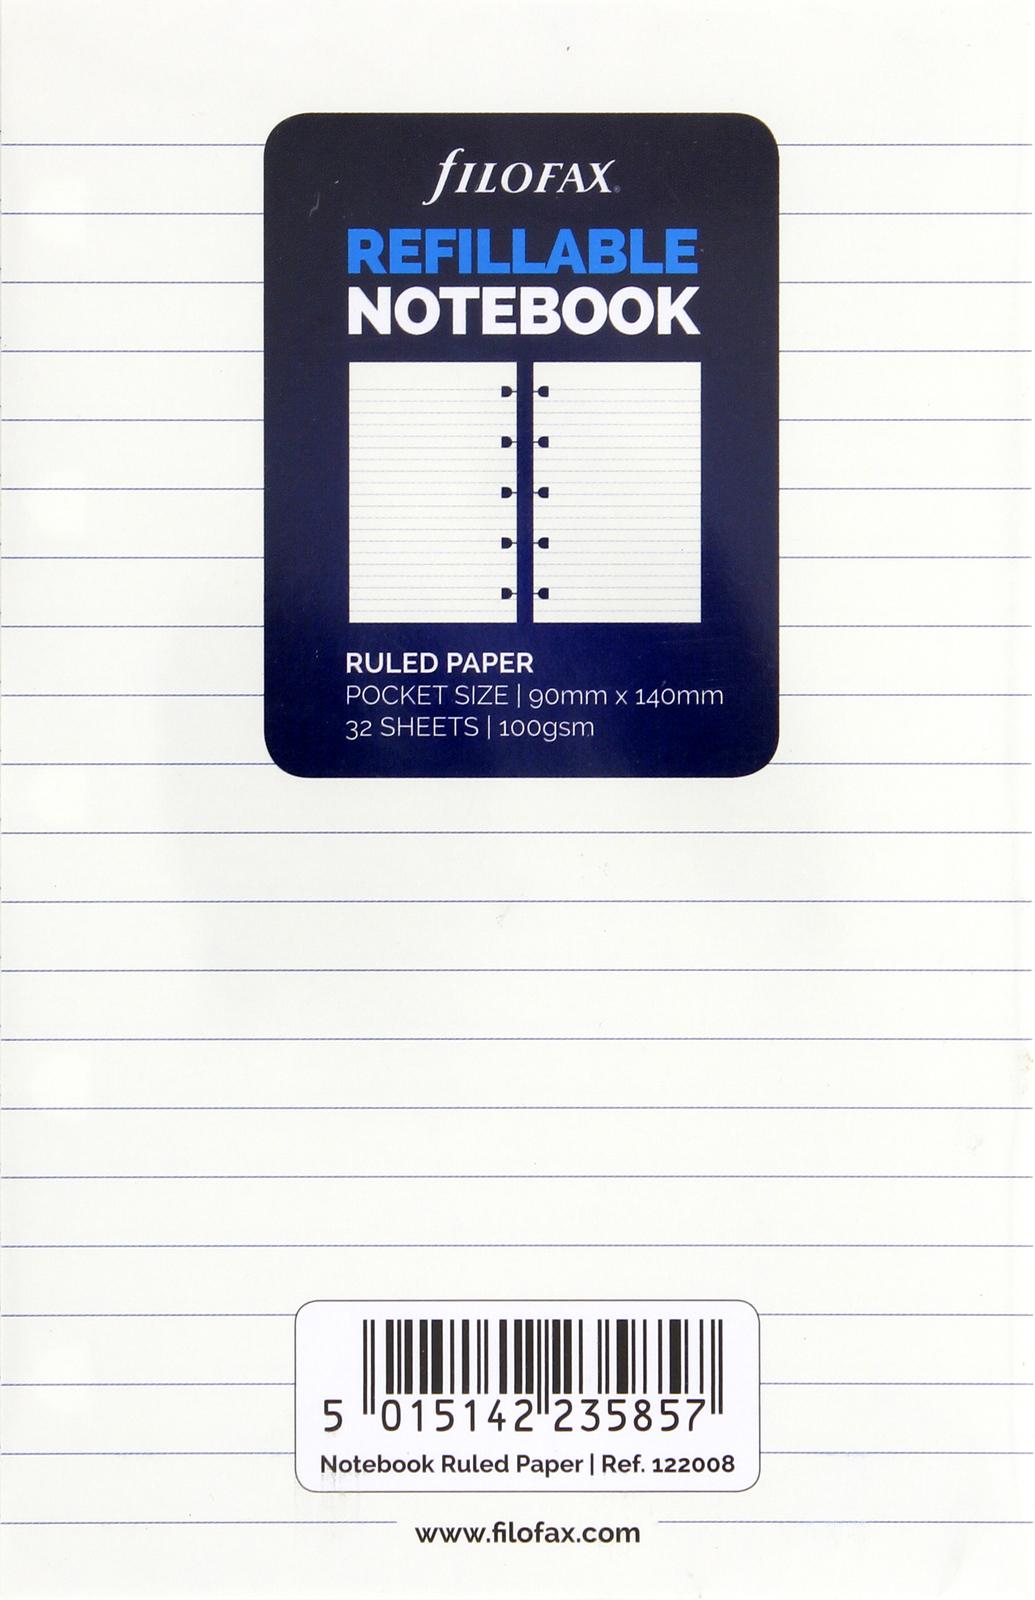 Filofax - Pocket Ruled Notebook Refill - White (32 Sheet) image